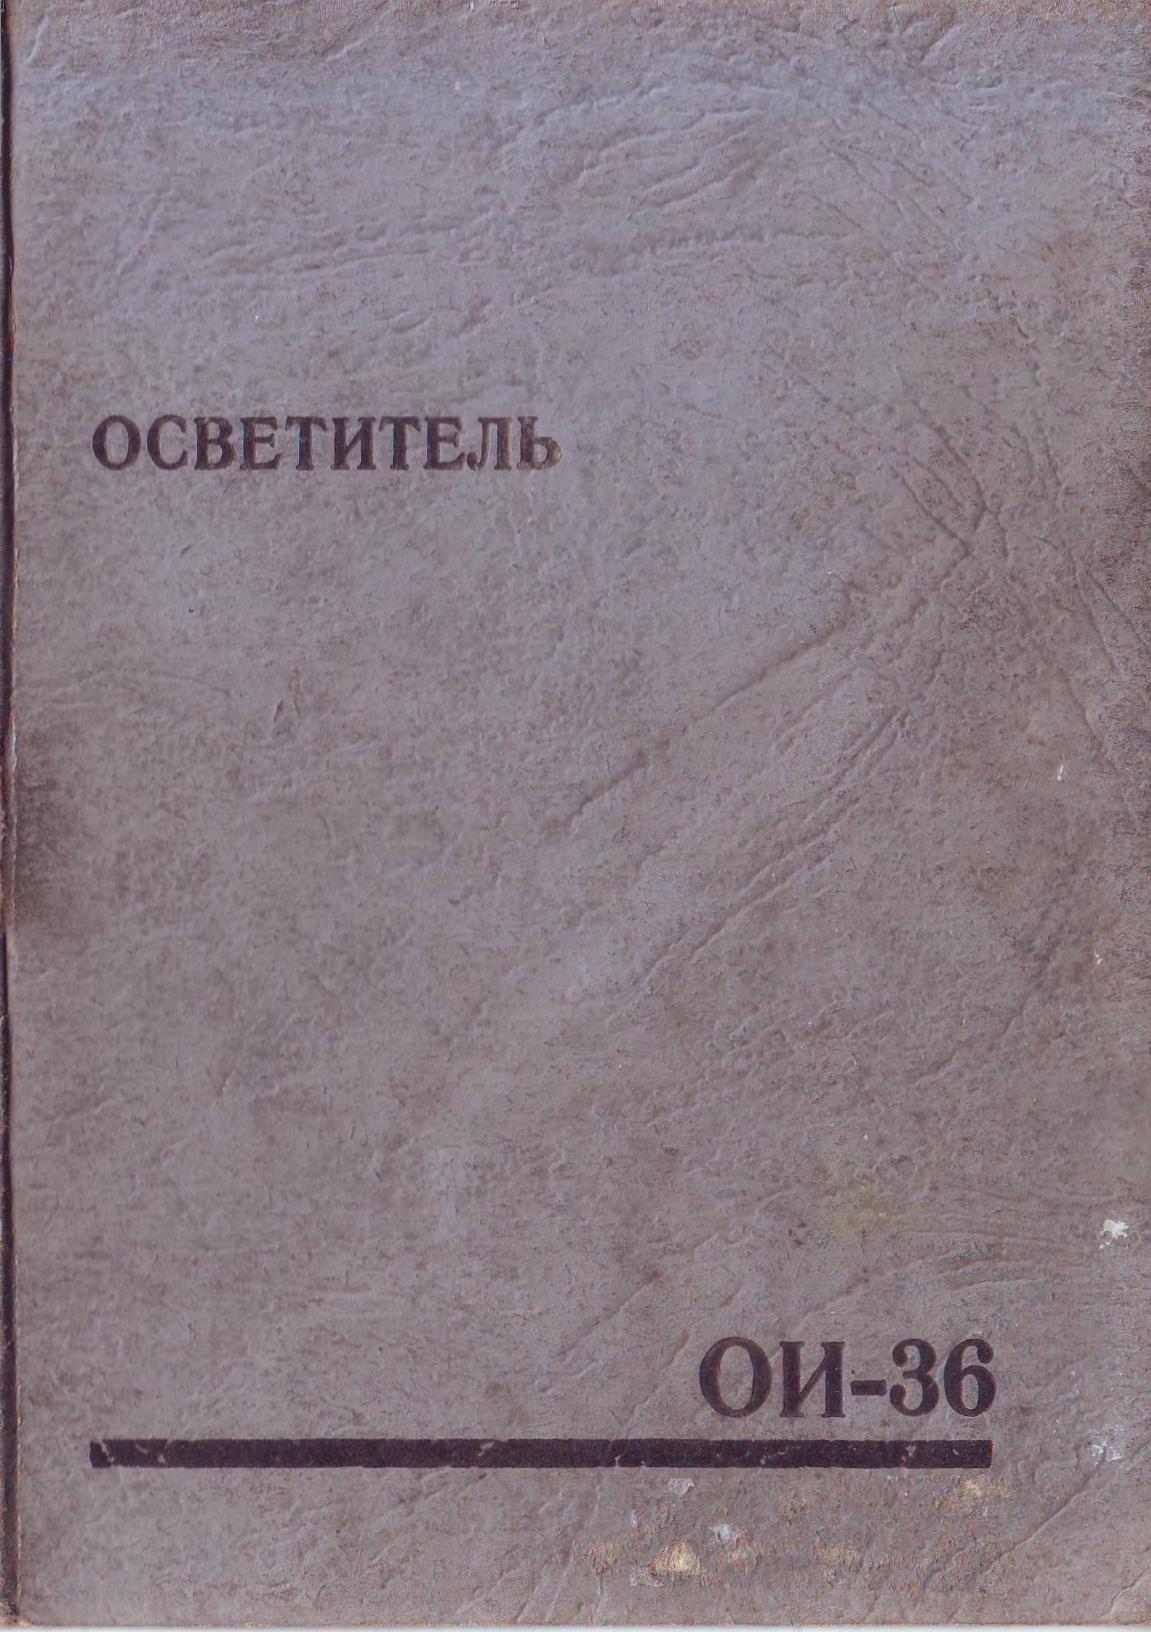 oi-36-0001